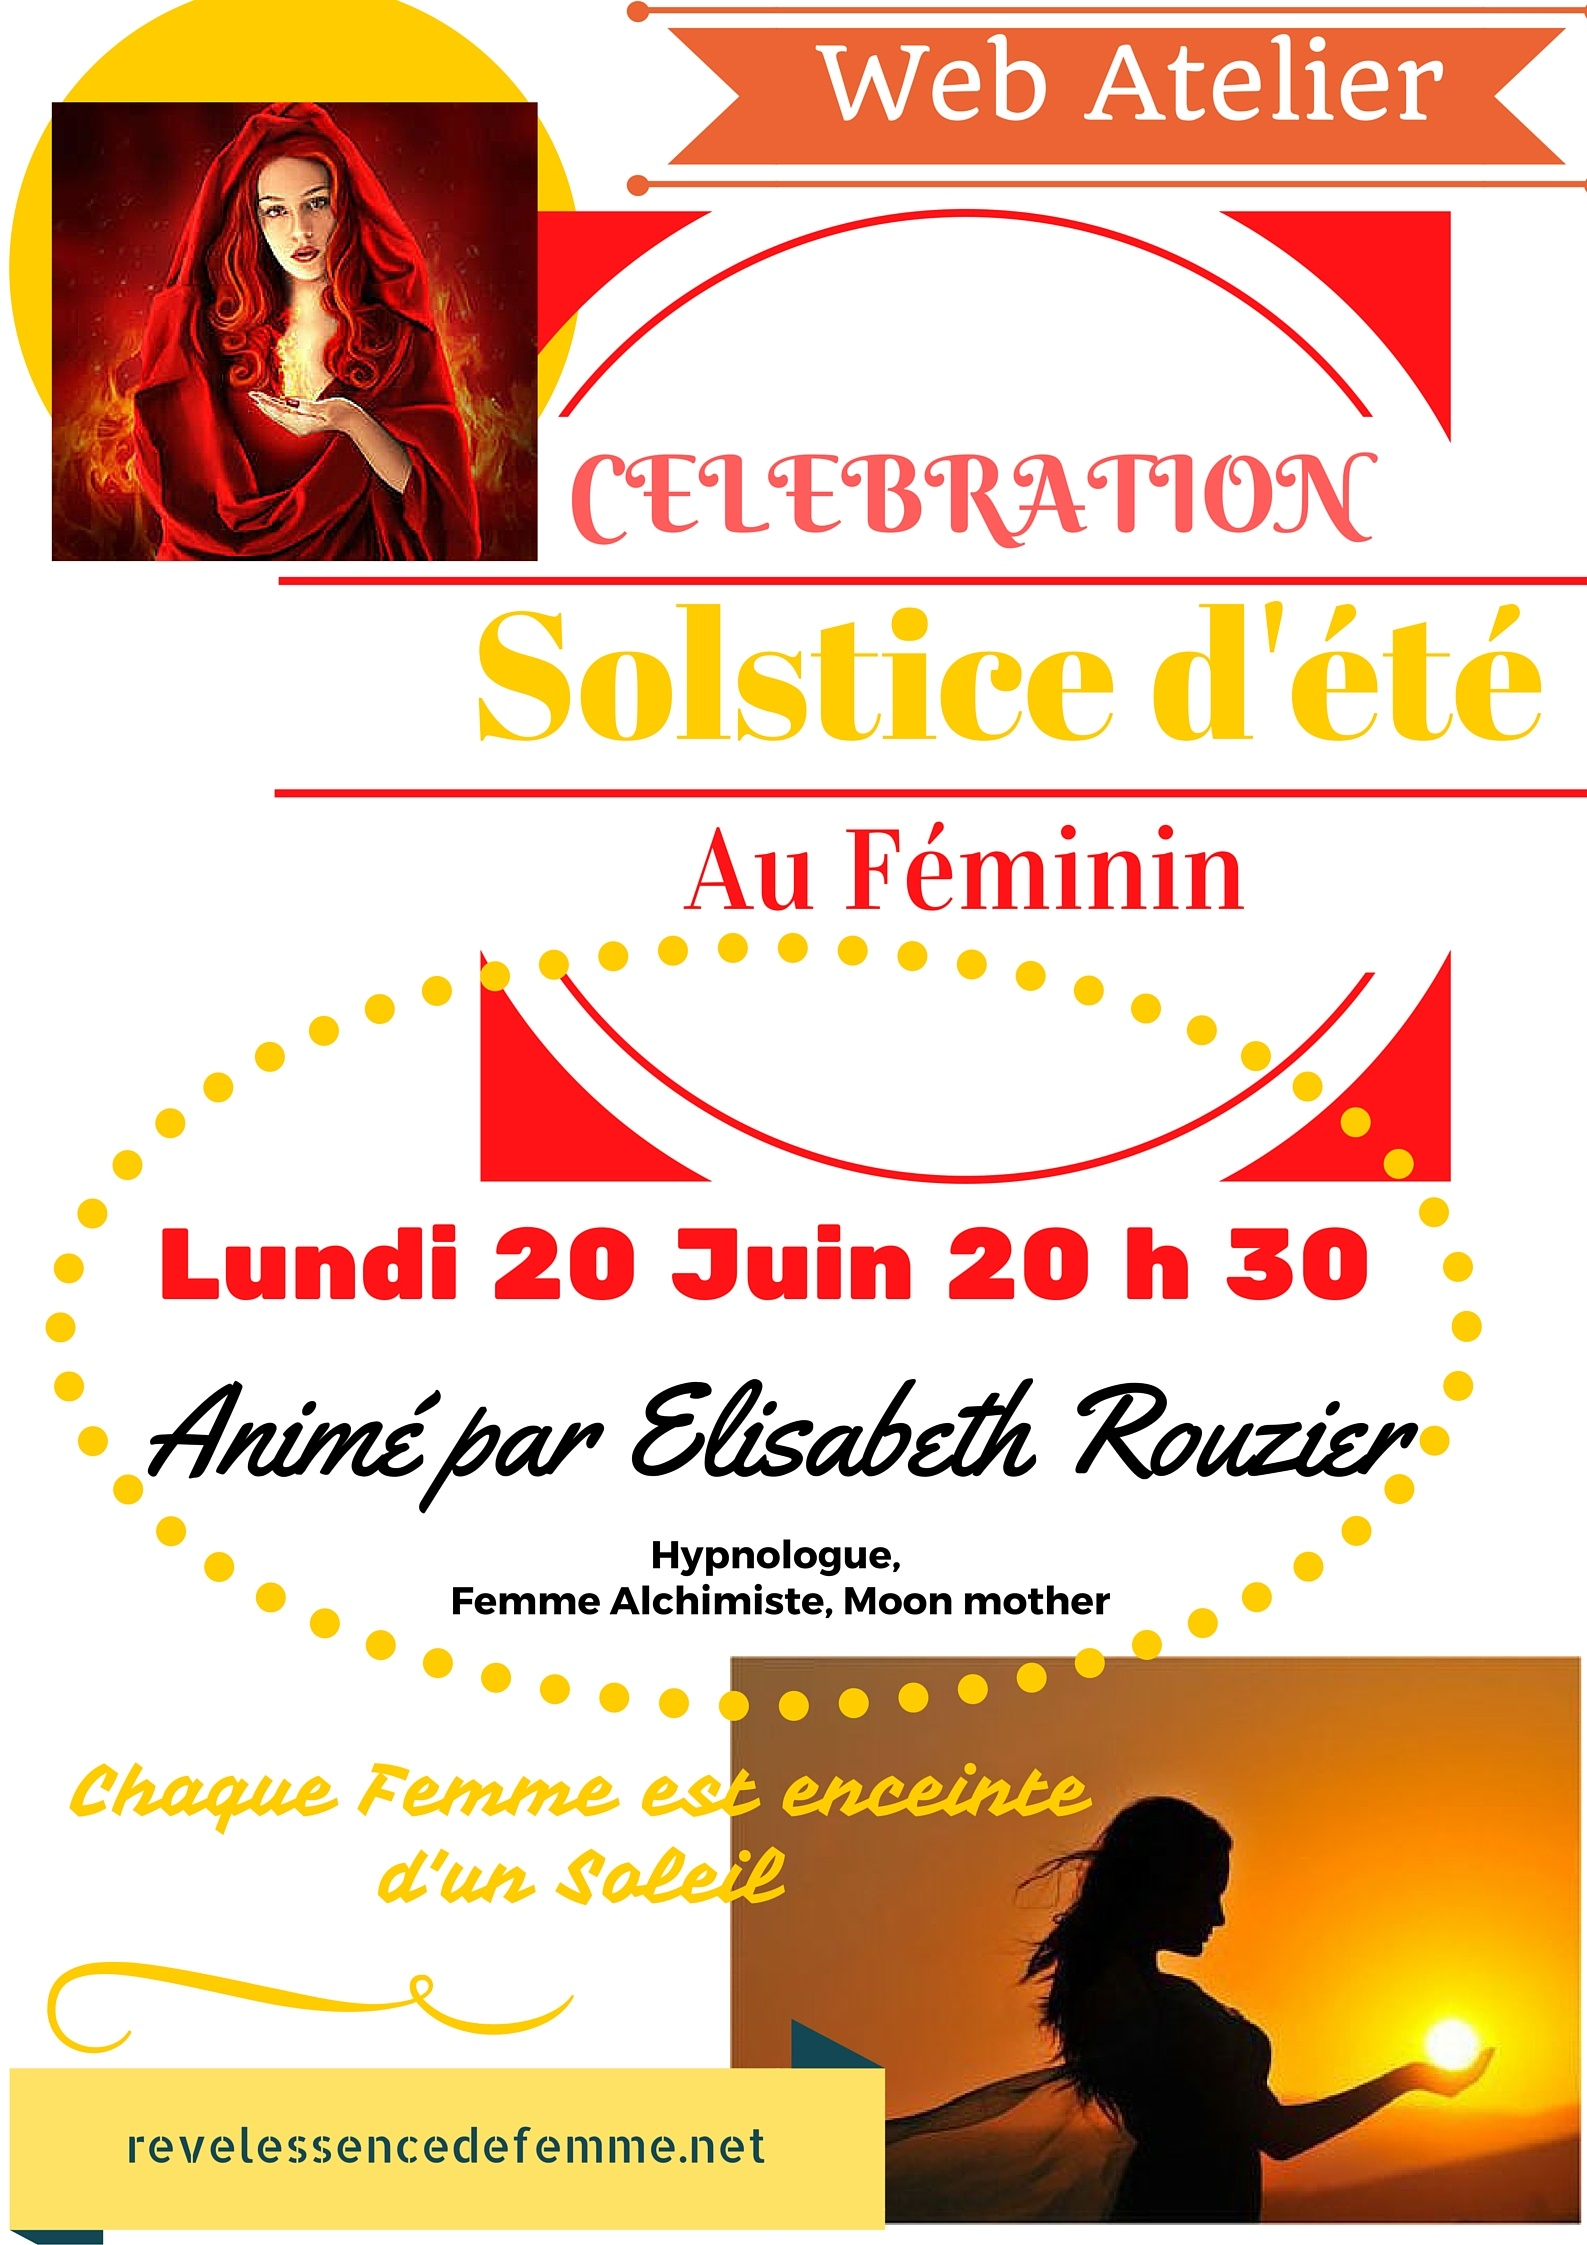 affiche web atelier solstice.jpg